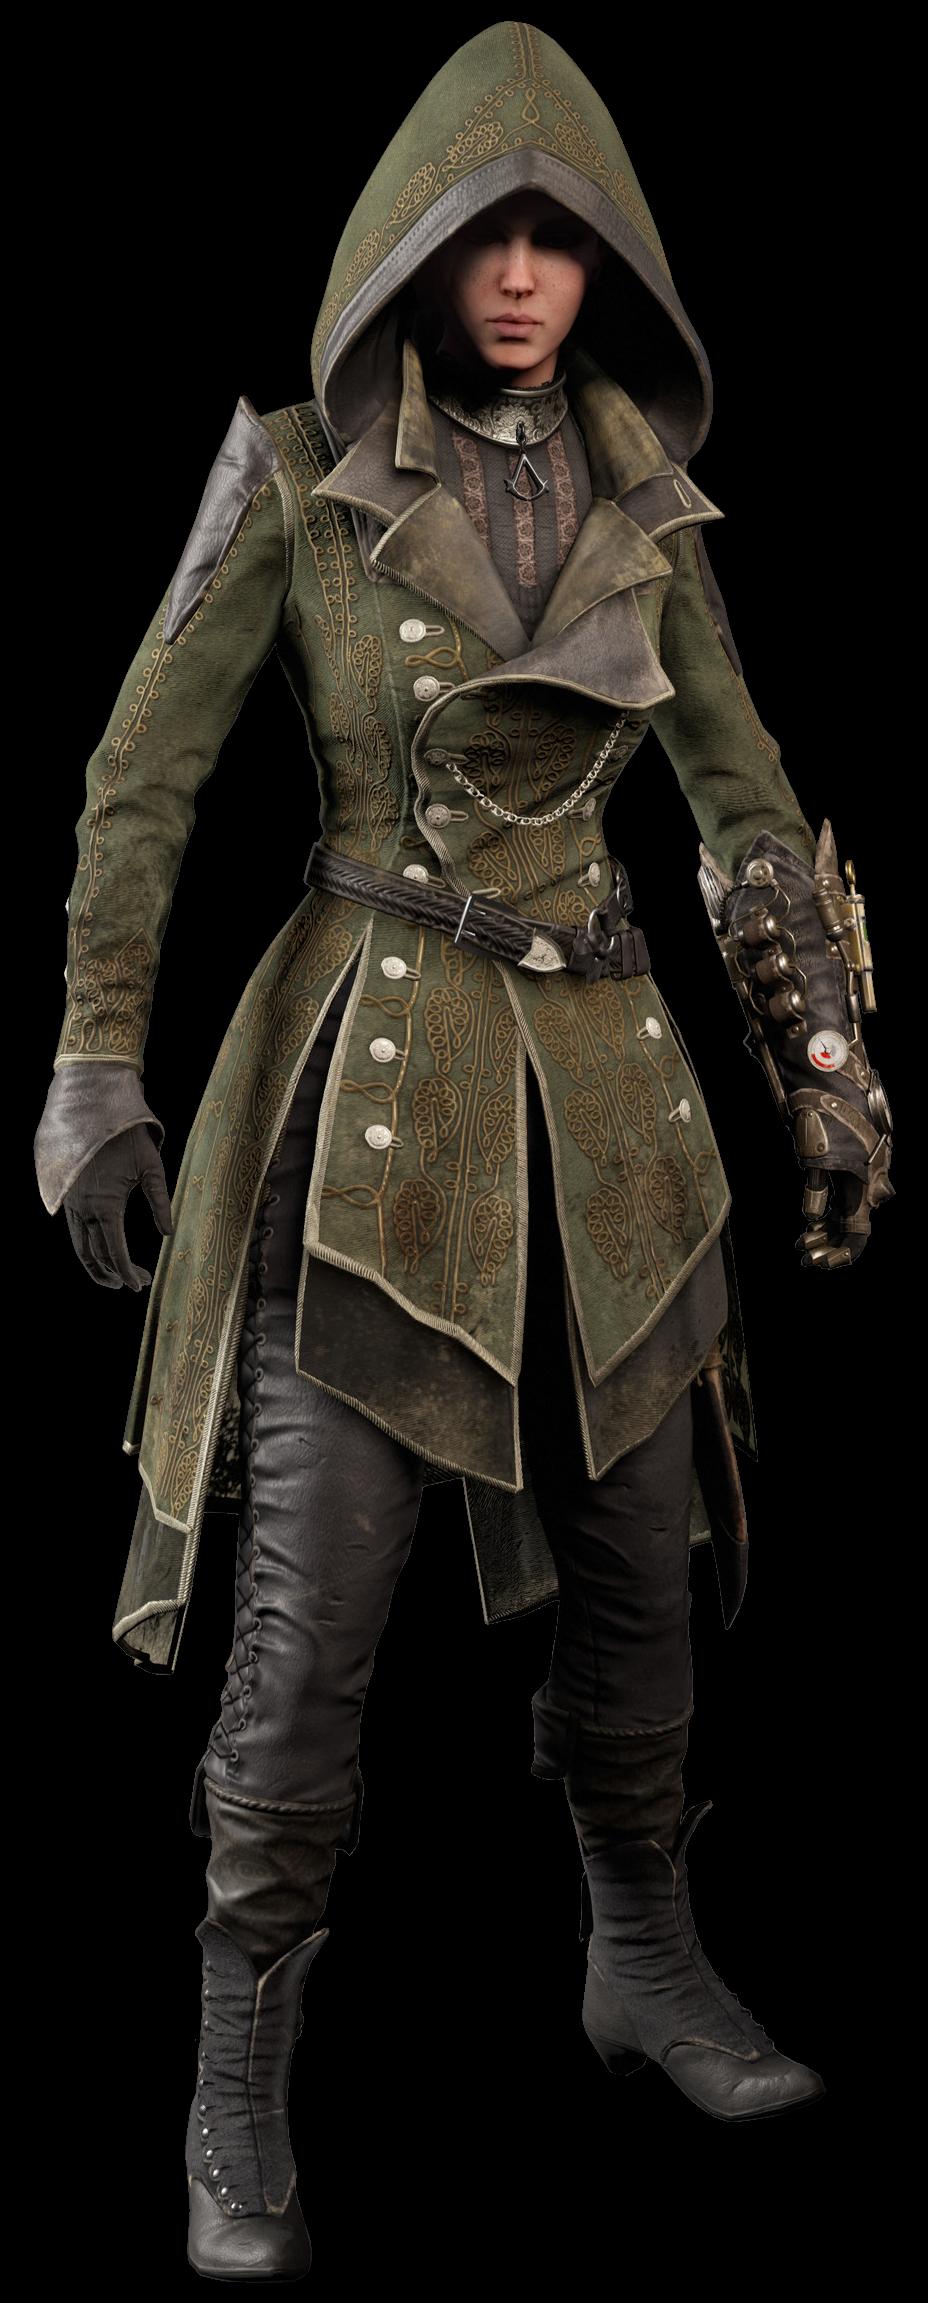 Lydia Frye Assassin S Creed Wiki Wikia Assassins Creed Costume Assassins Creed Cosplay Assassins Creed